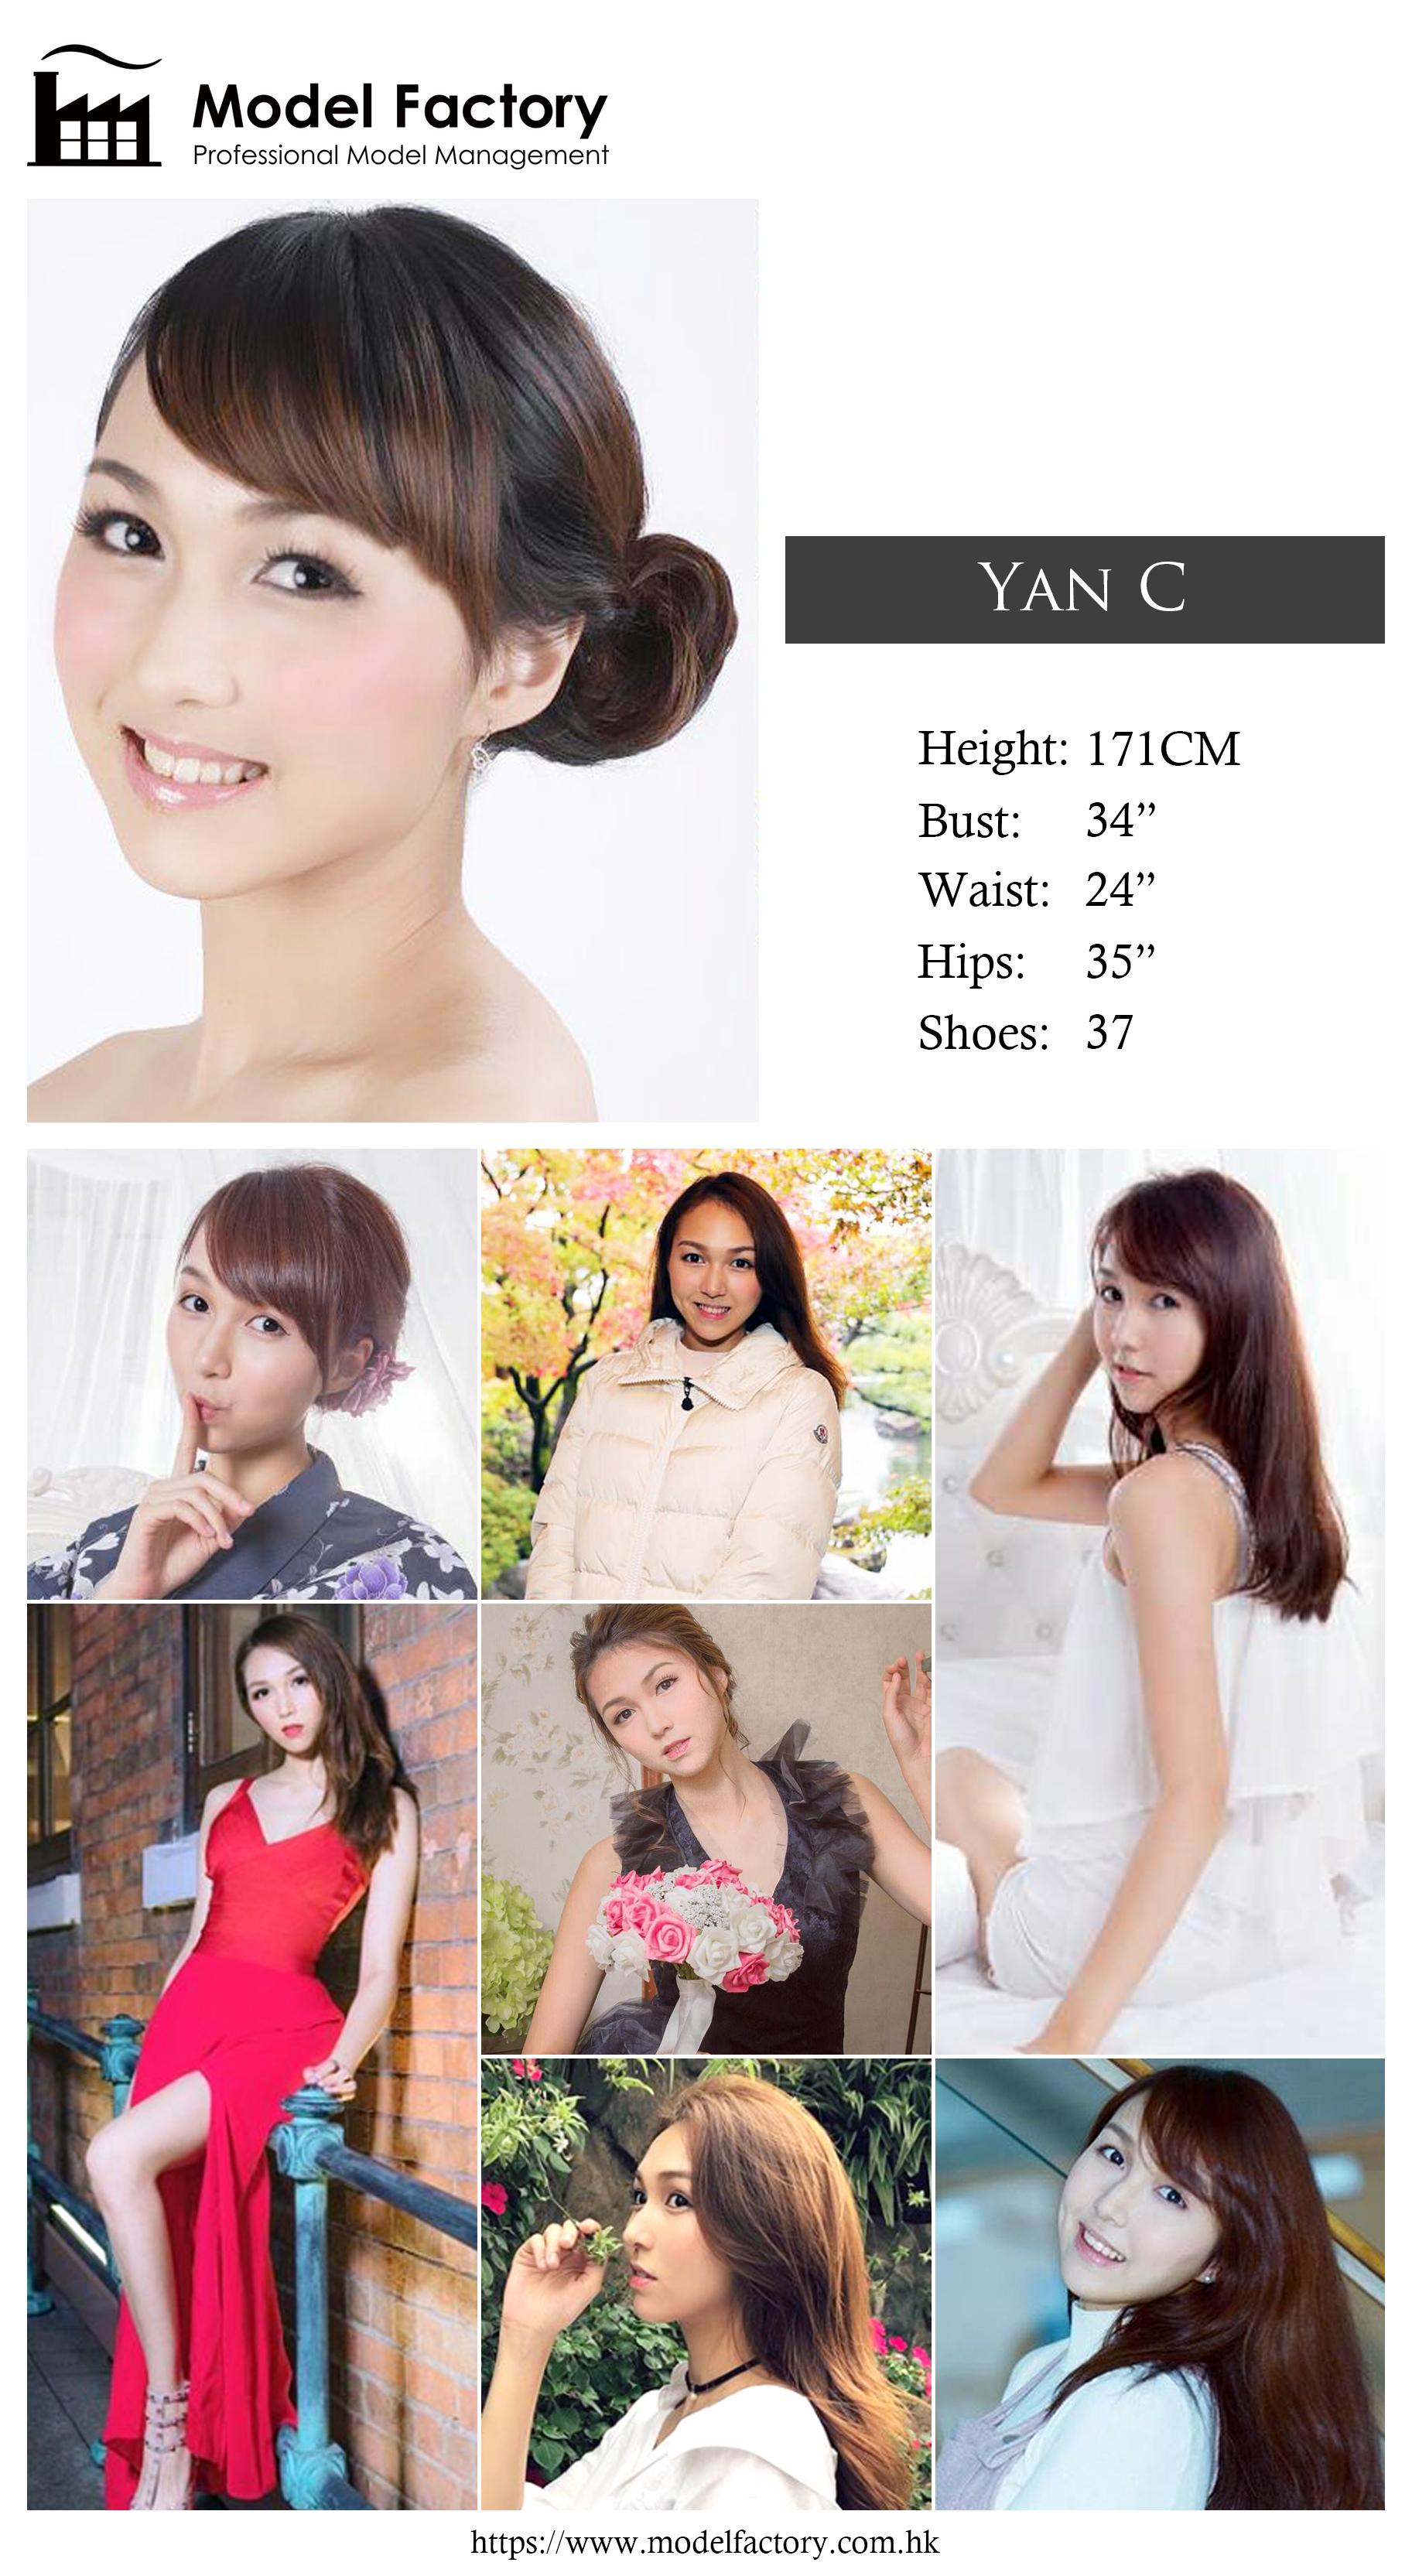 Model Factory Hong Kong Female Model YanC